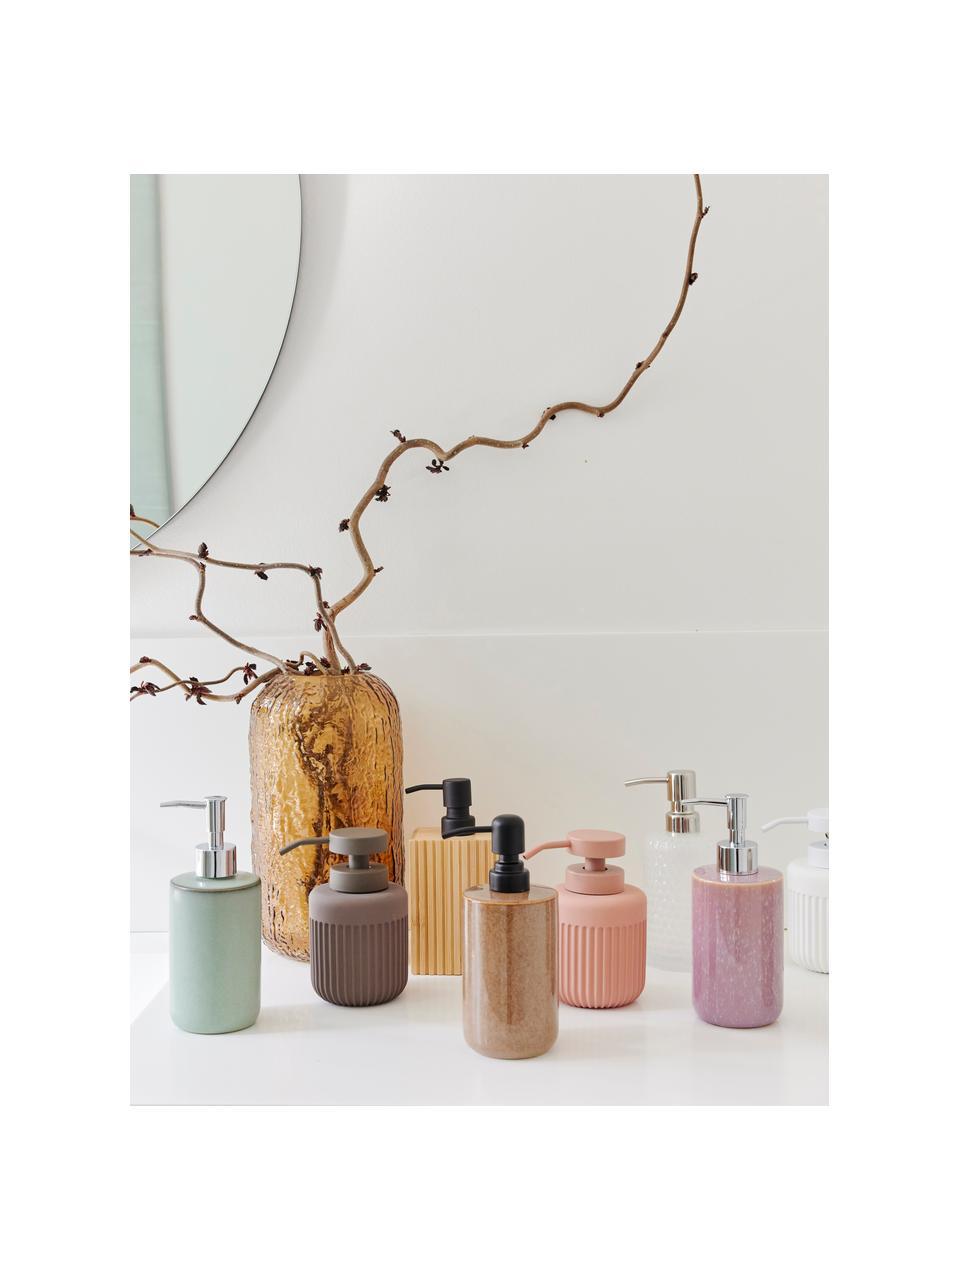 Keramik-Seifenspender Tin in Braun, Behälter: Keramik, Braun, Schwarz, Ø 8 x H 13 cm